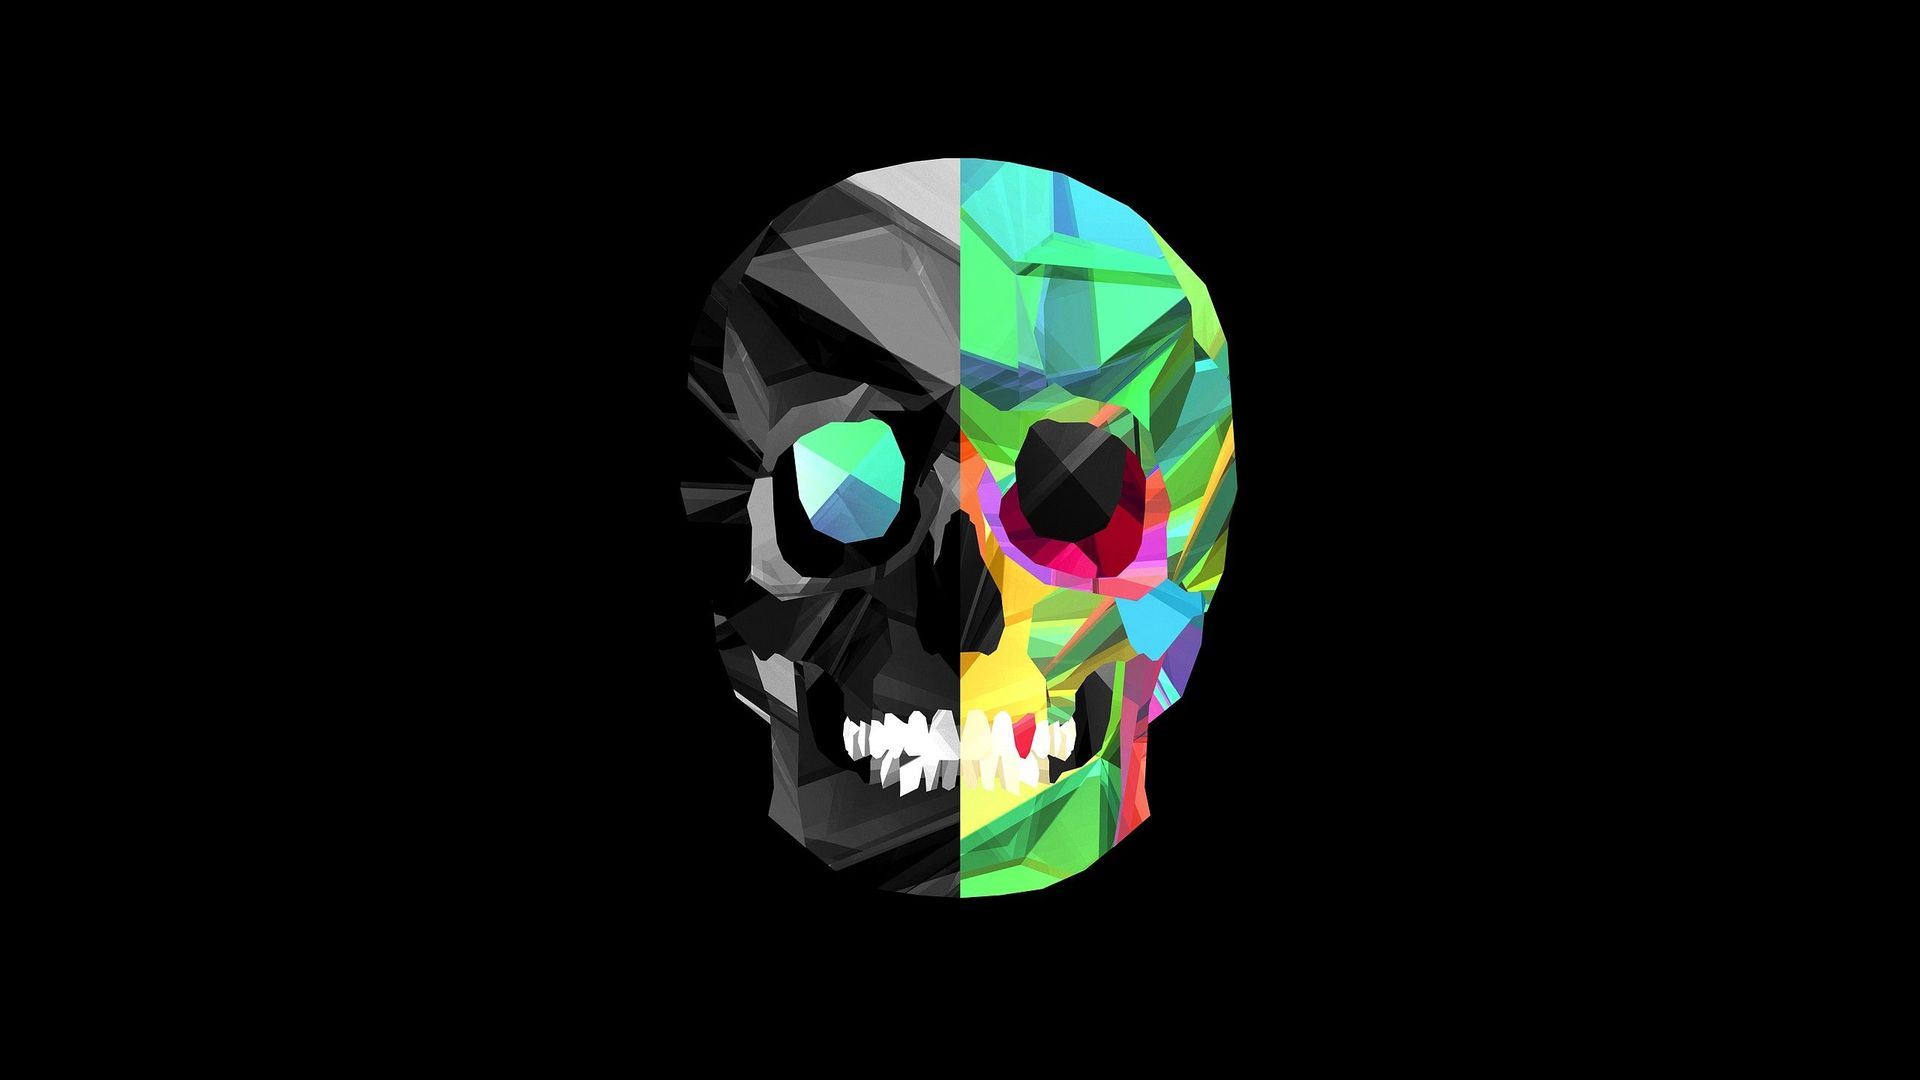 cool skull wallpapers HD 1920x1080